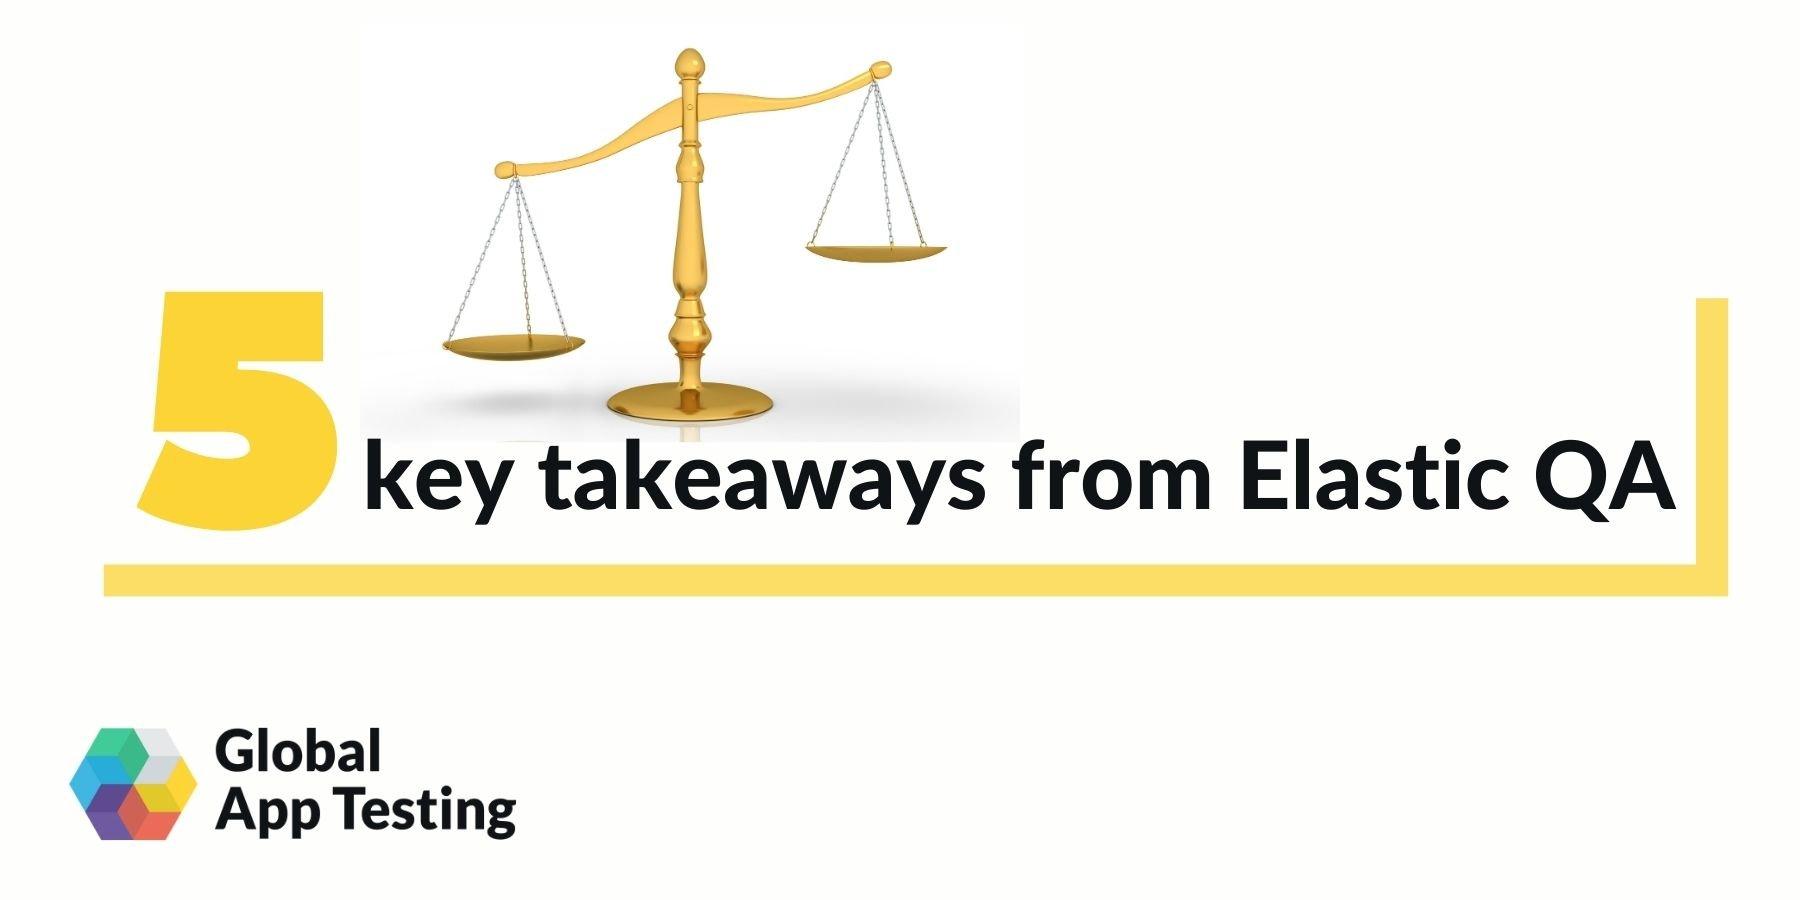 key takeaways from Elastic QA